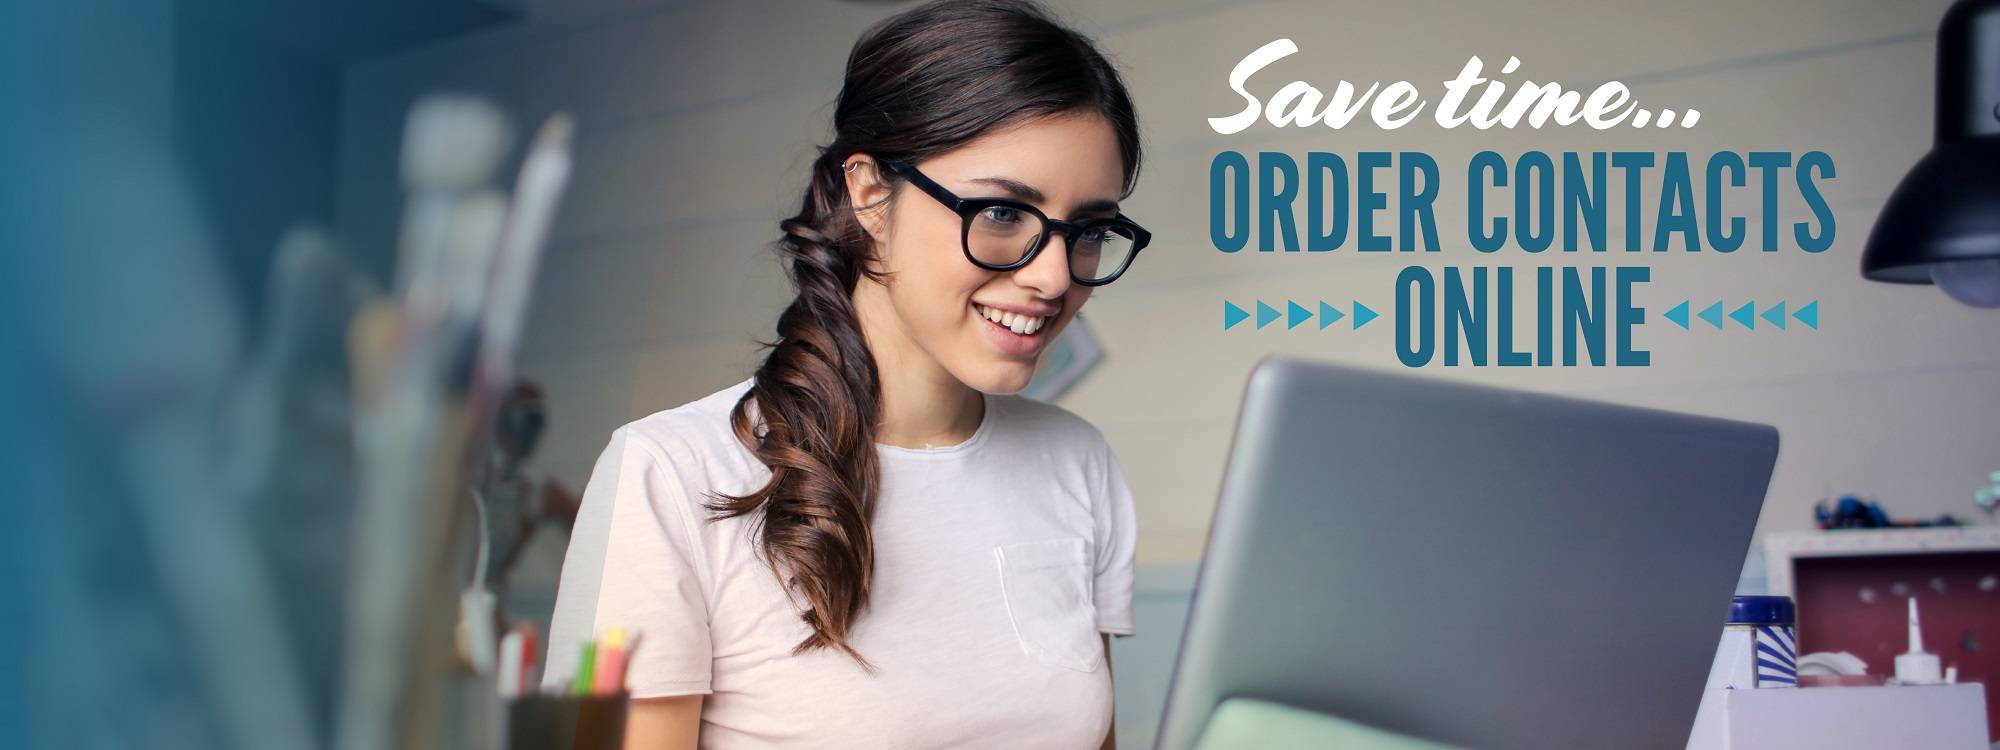 Woman-laptop-ordering-Header4